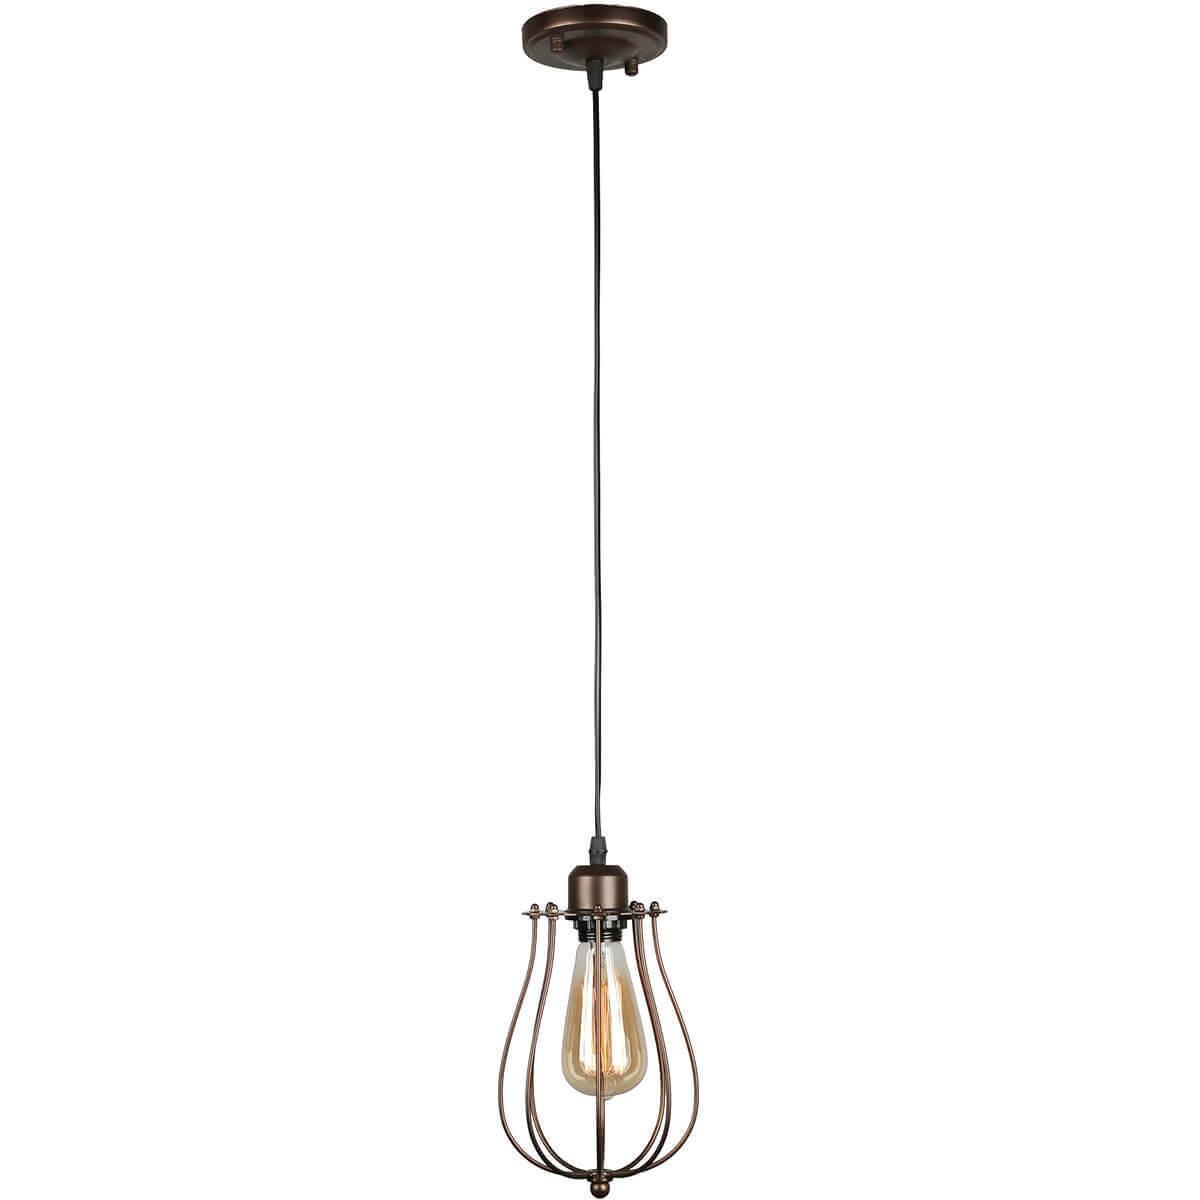 Подвесной светильник Omnilux OML-90006-01, E14, 40 Вт